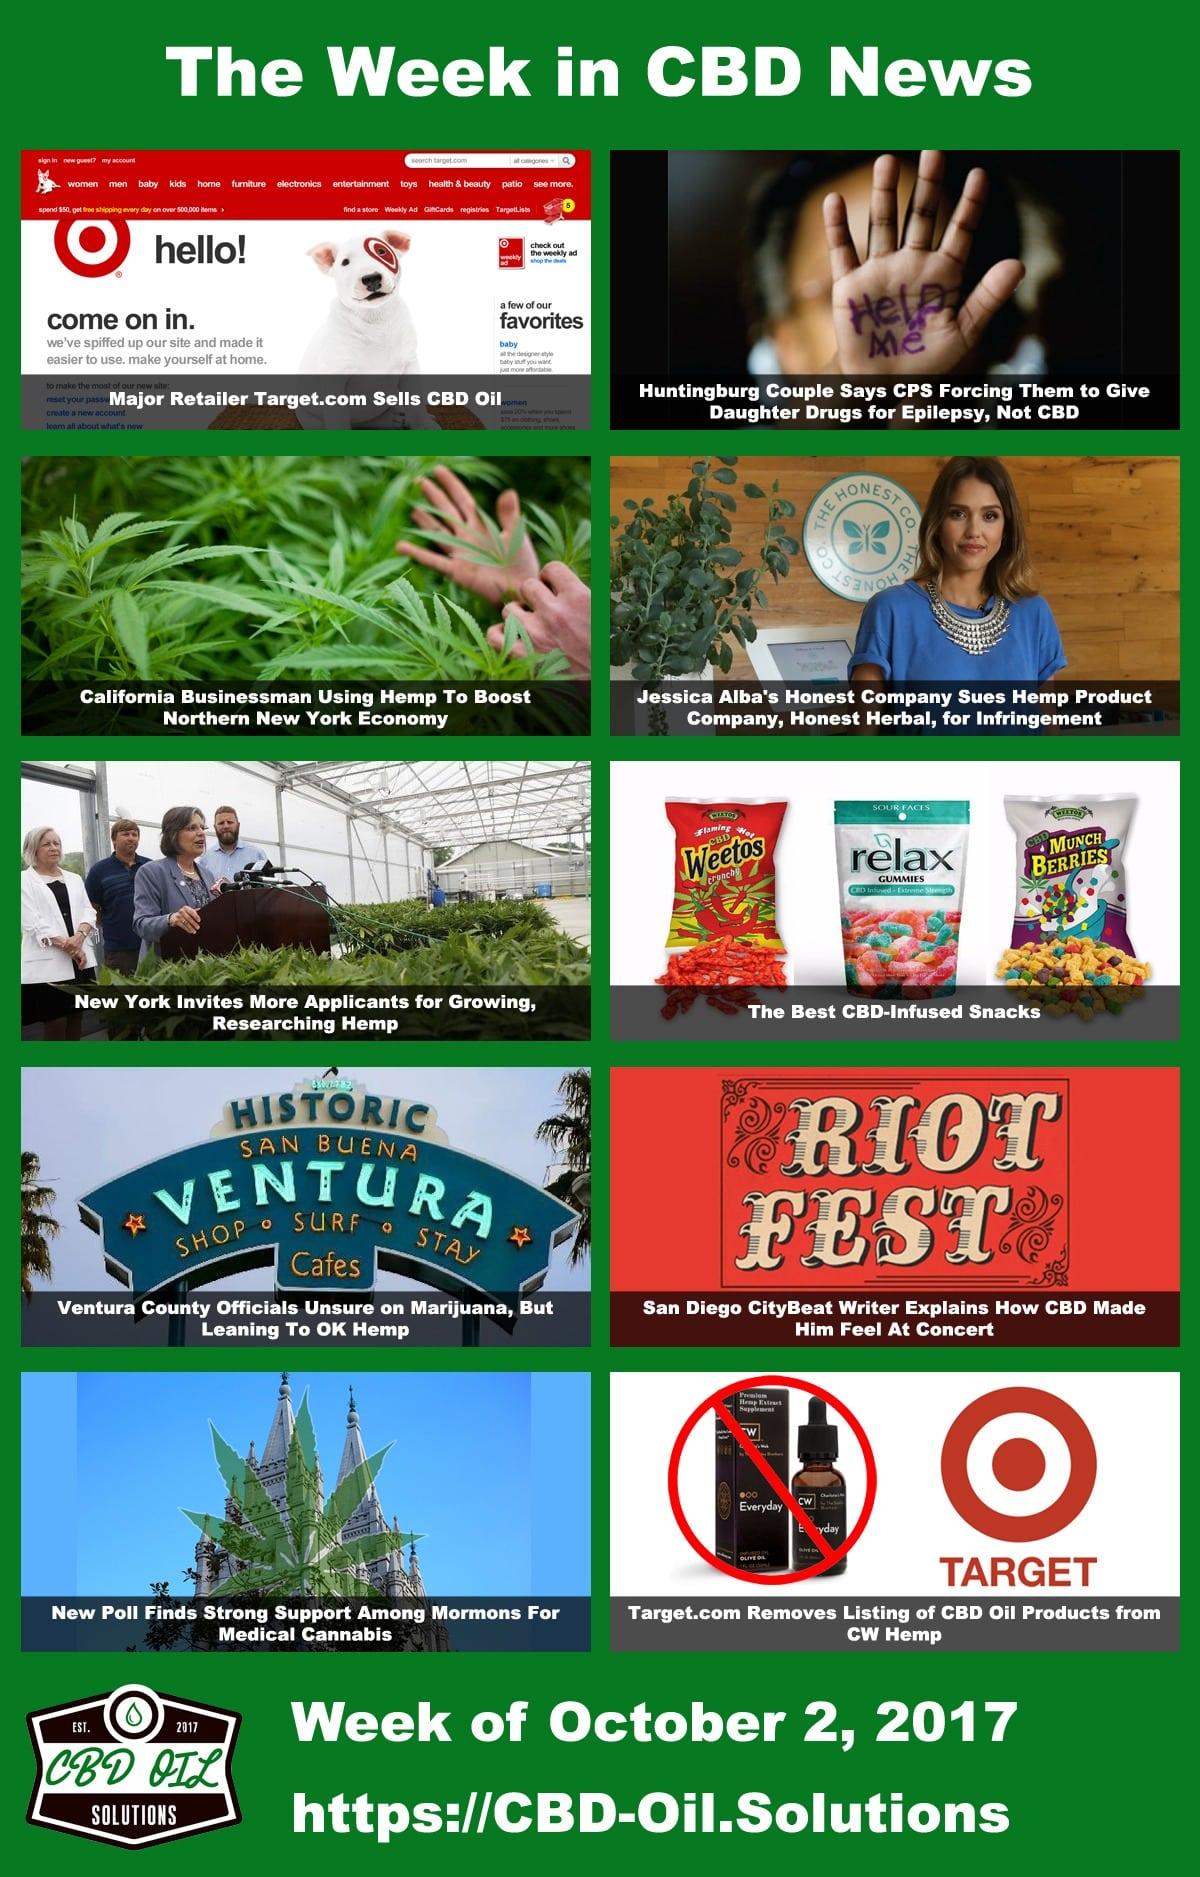 target-sells-cbd-week-in-cbd-news